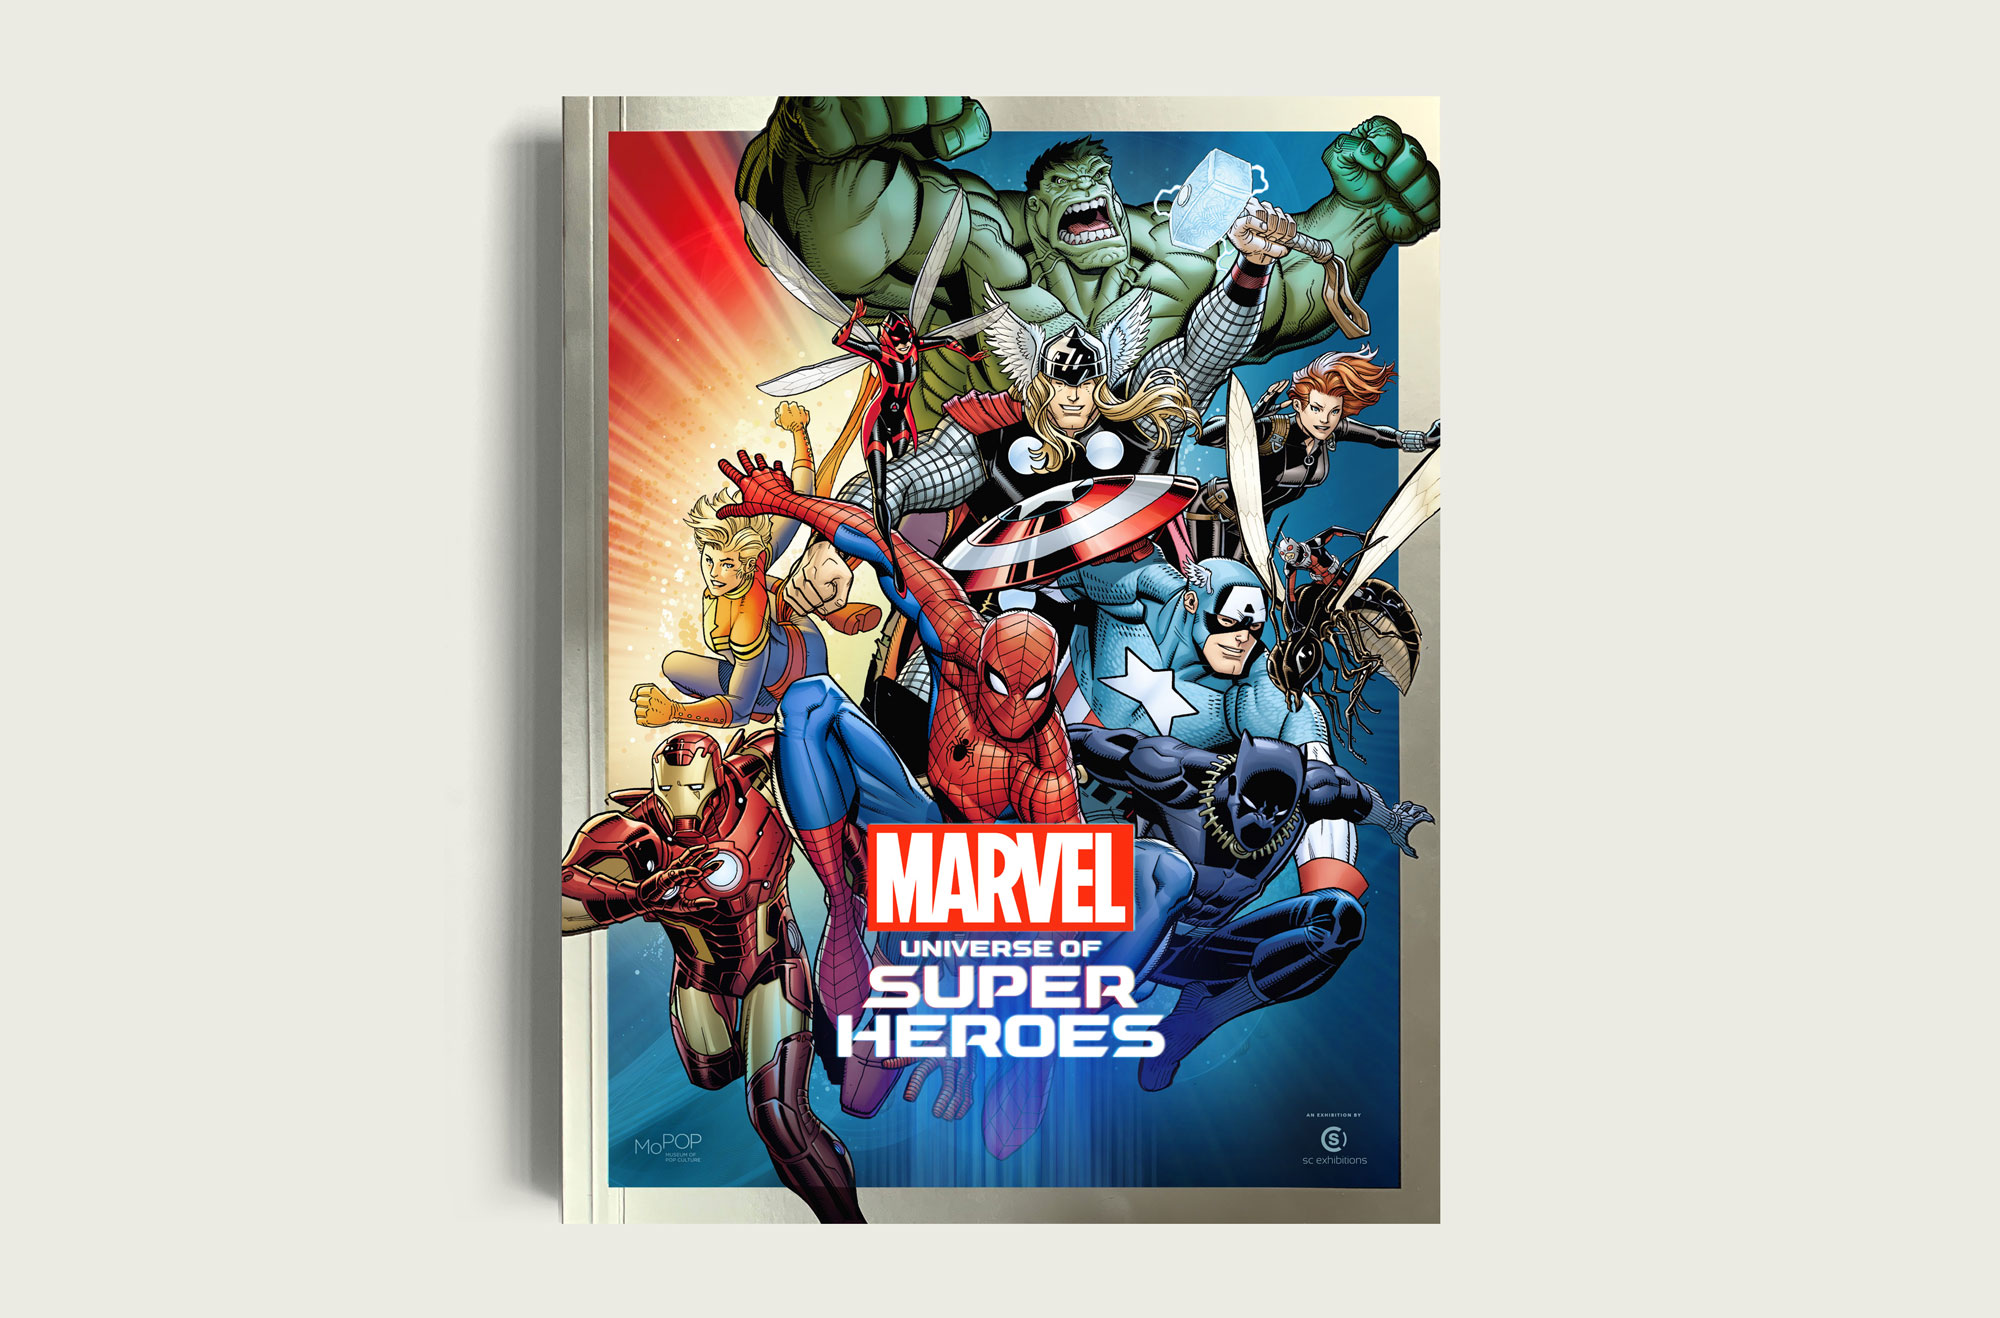 Marvel-Universe-of-Super-Heroes-Book-Balgavy-Cover.jpg